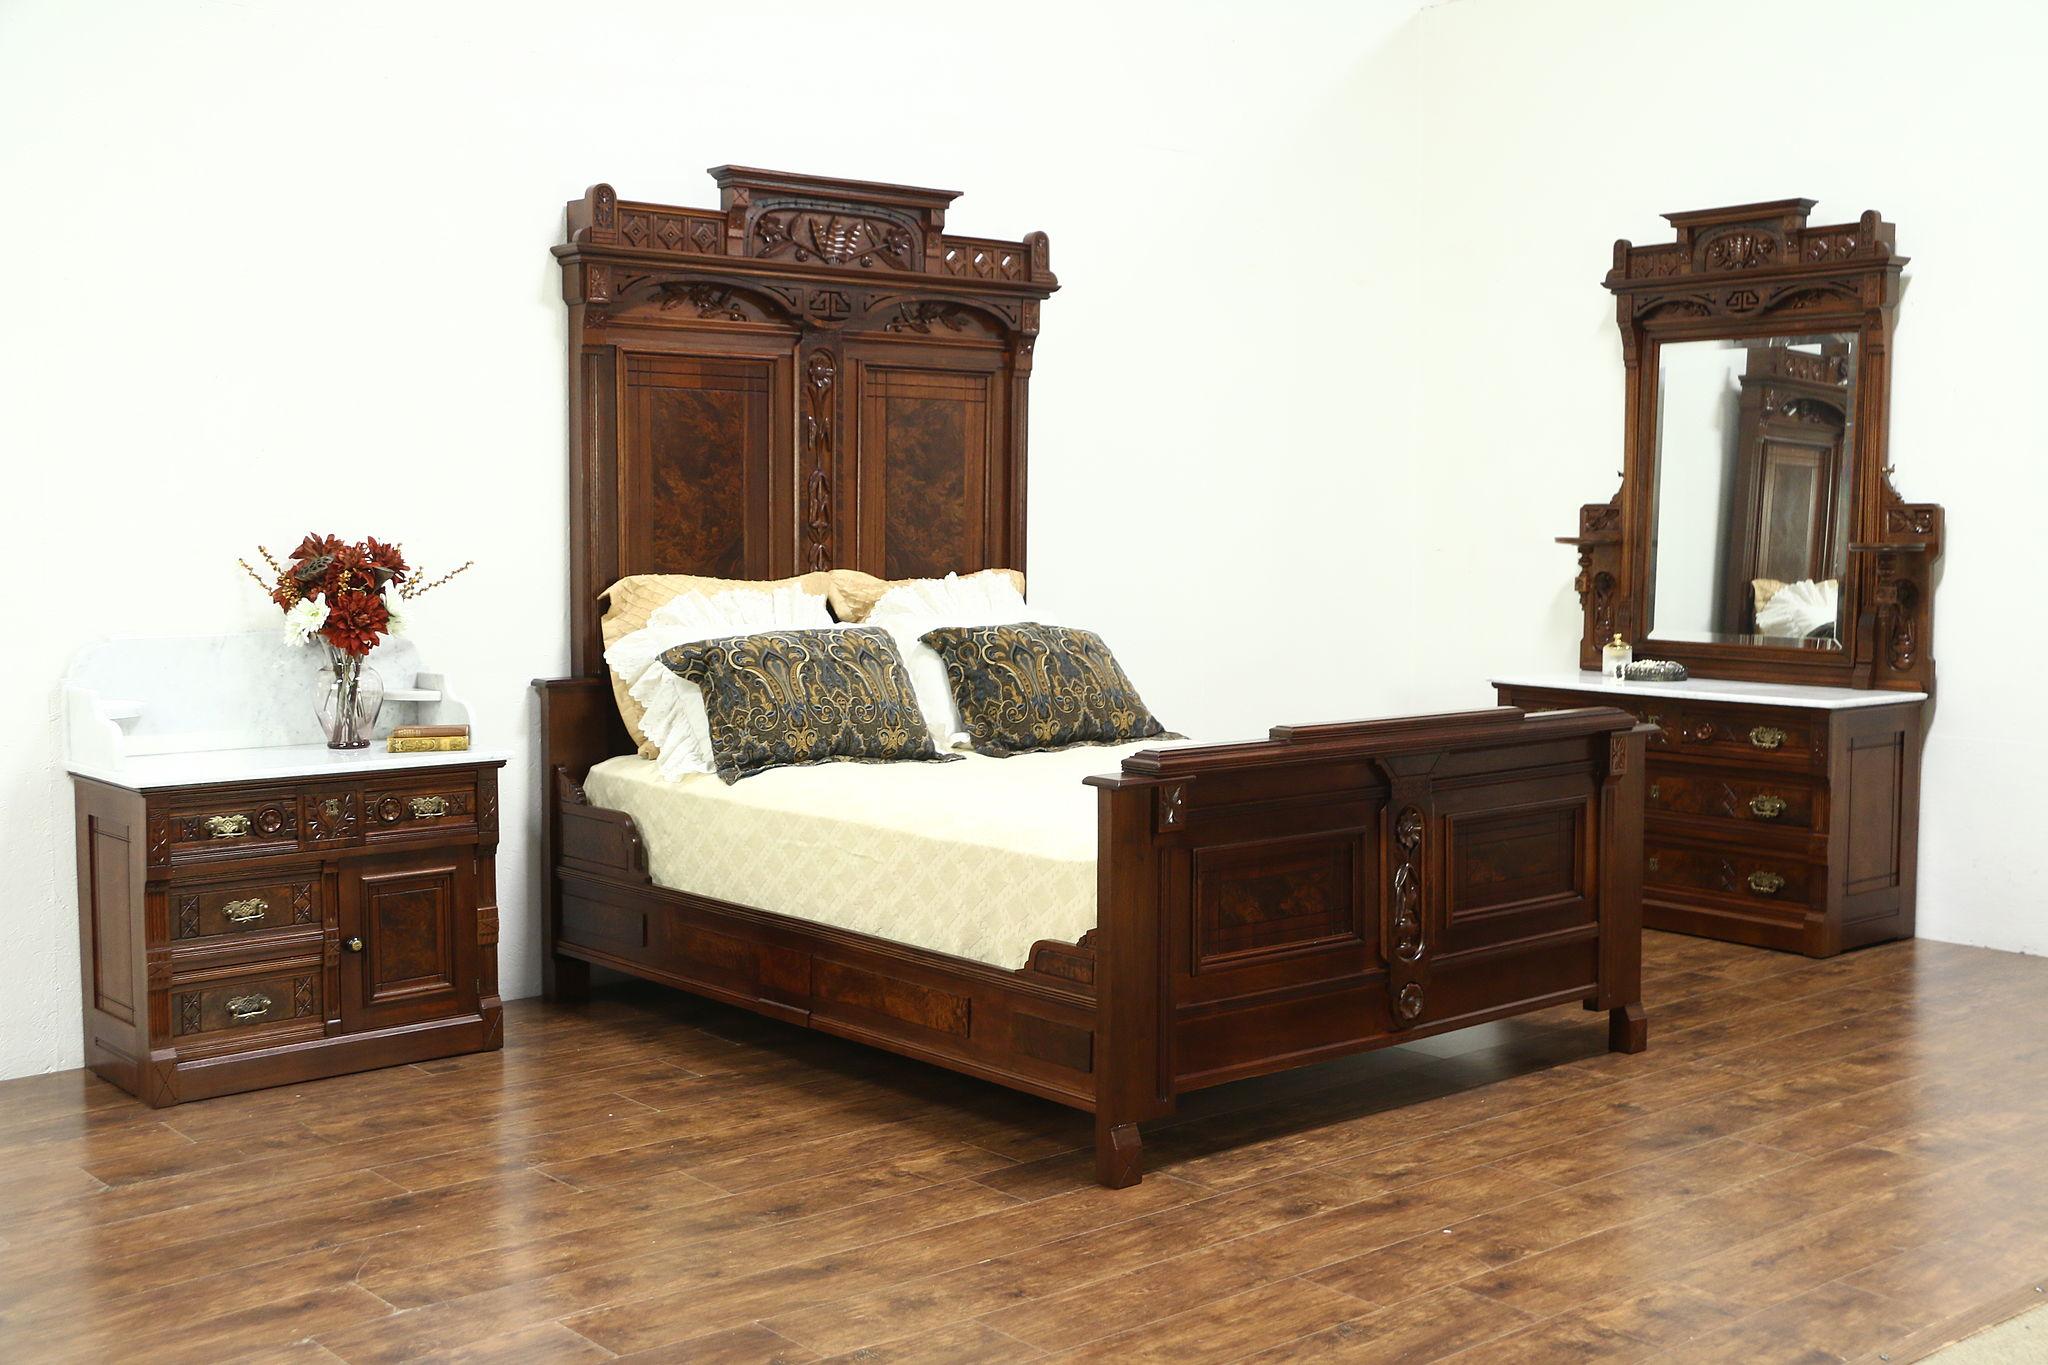 Sold Victorian Eastlake Antique Walnut Queen Size Bedroom Set Marble Tops 28866 Harp Gallery Antiques Furniture